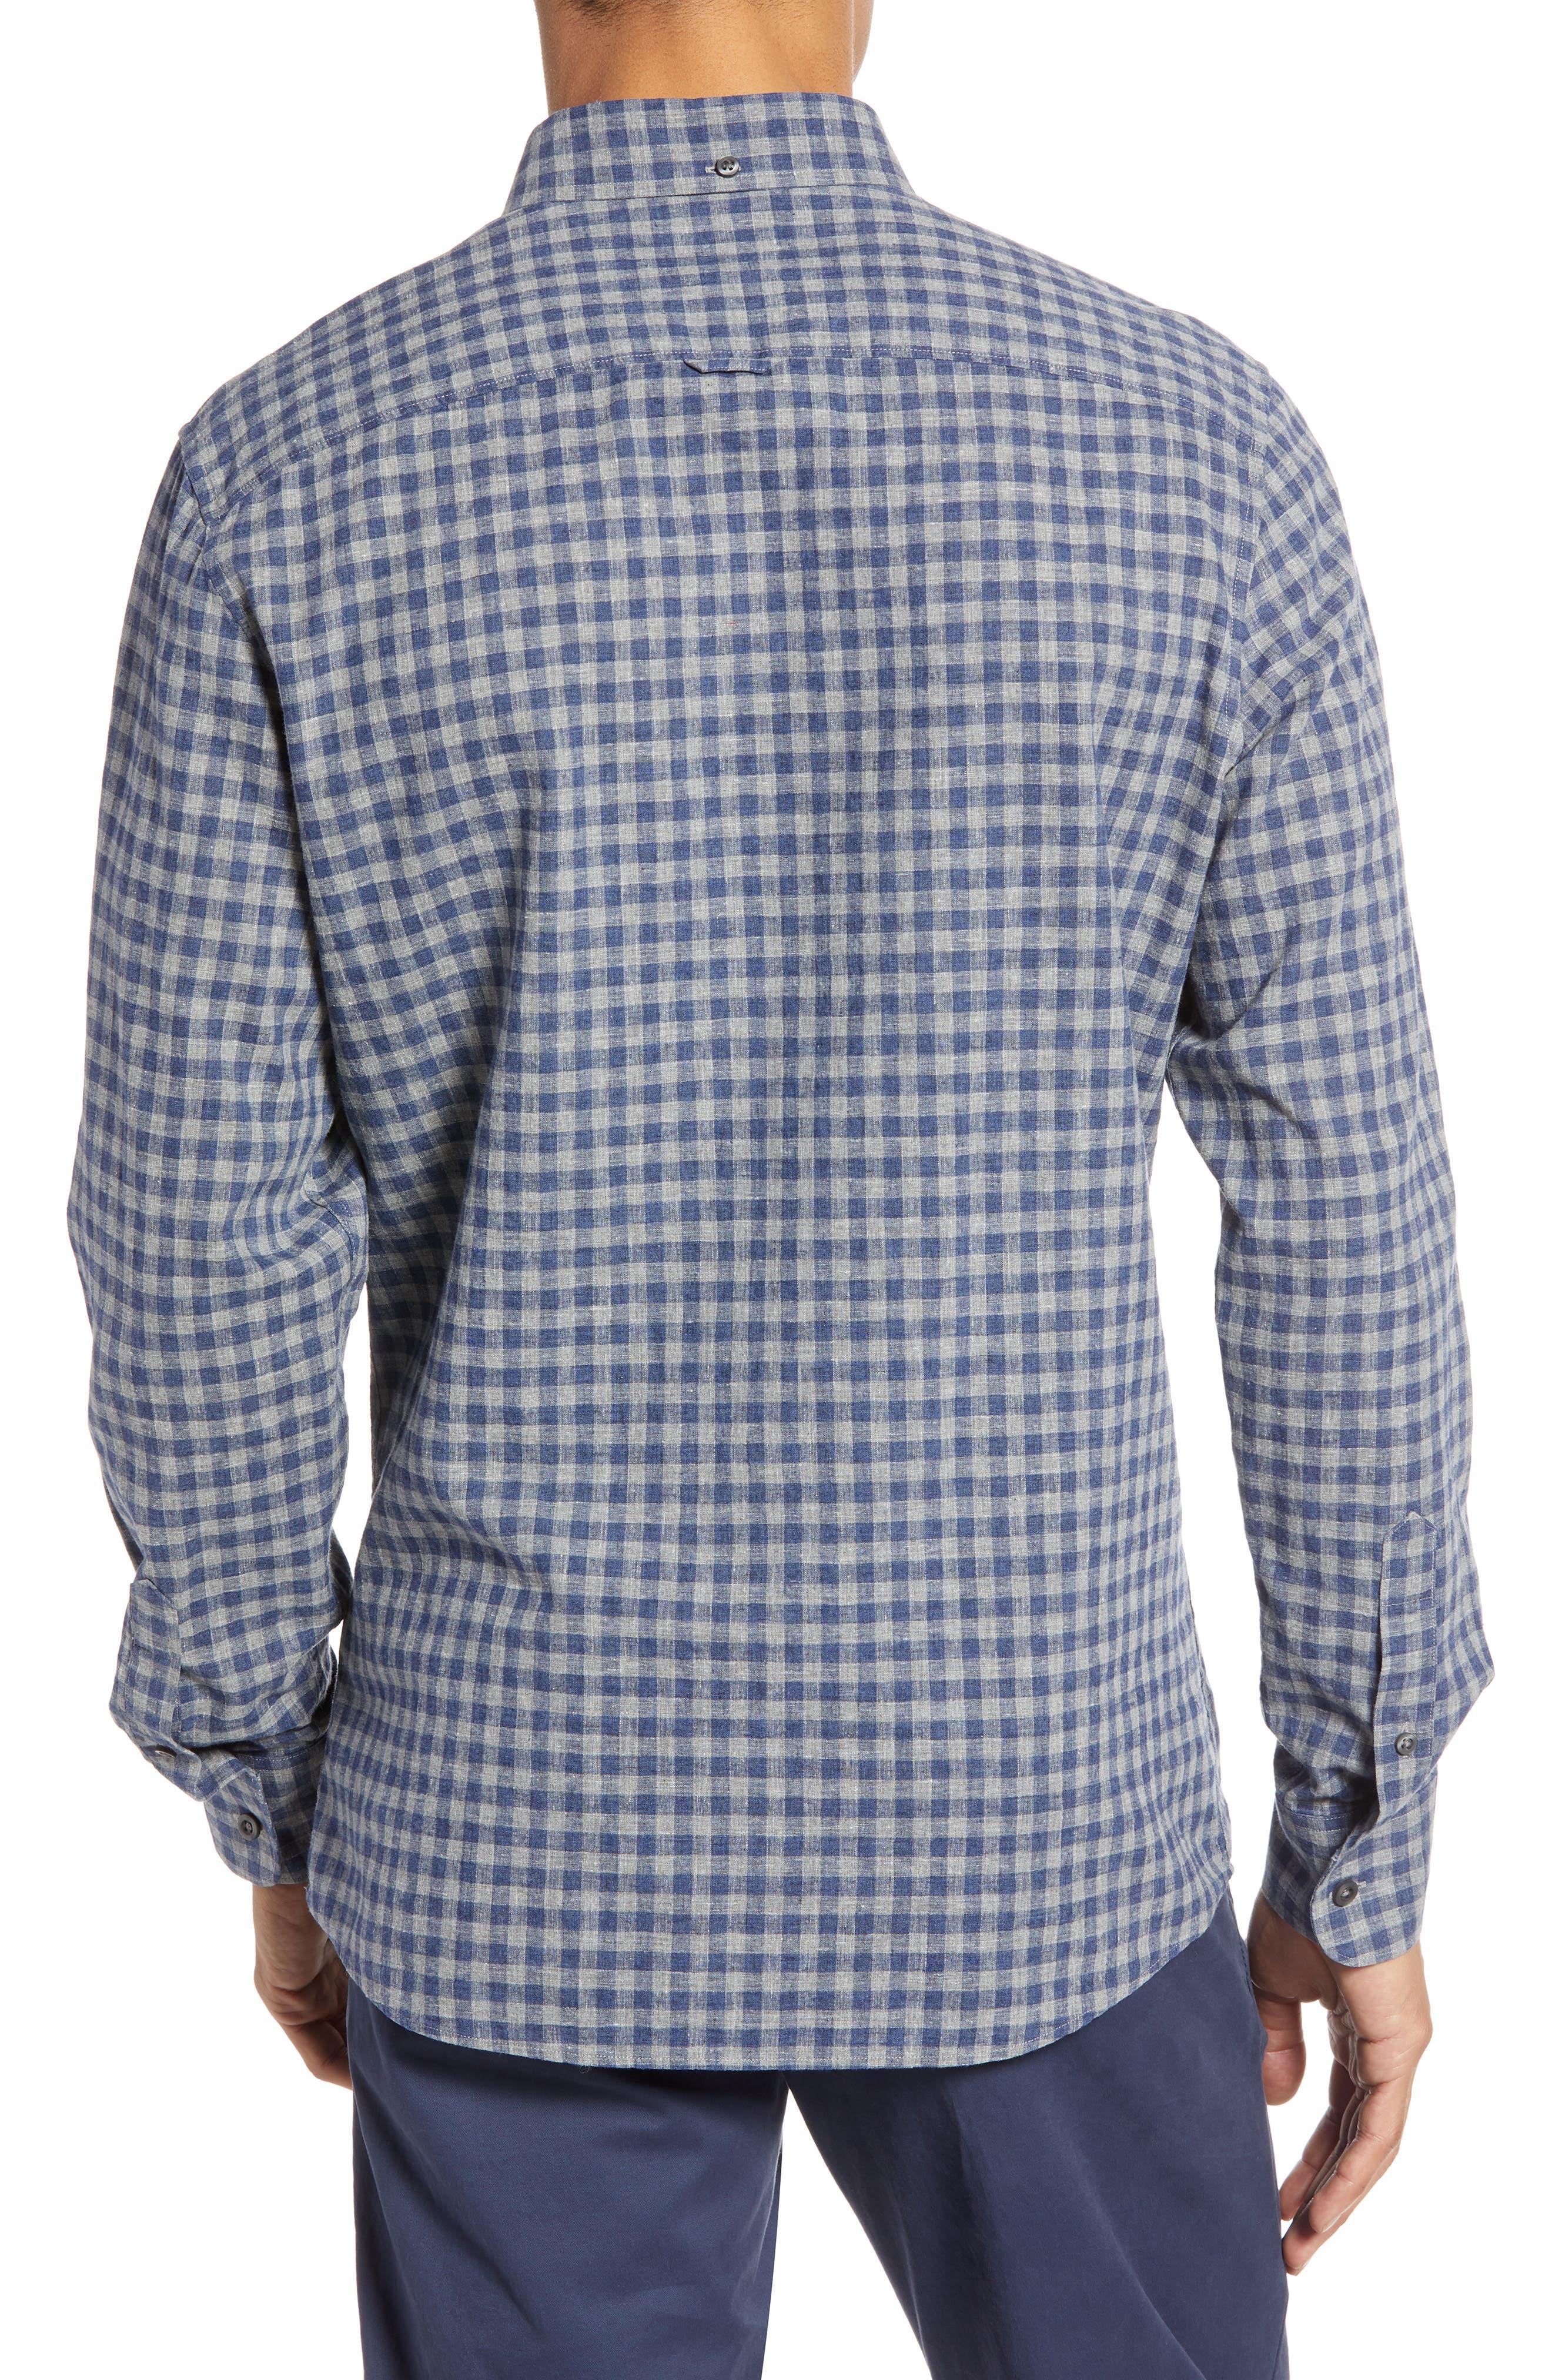 1901, Heather Gingham Linen Blend Slim Fit Sport Shirt, Alternate thumbnail 3, color, GREY OIL NAVY GINGHAM